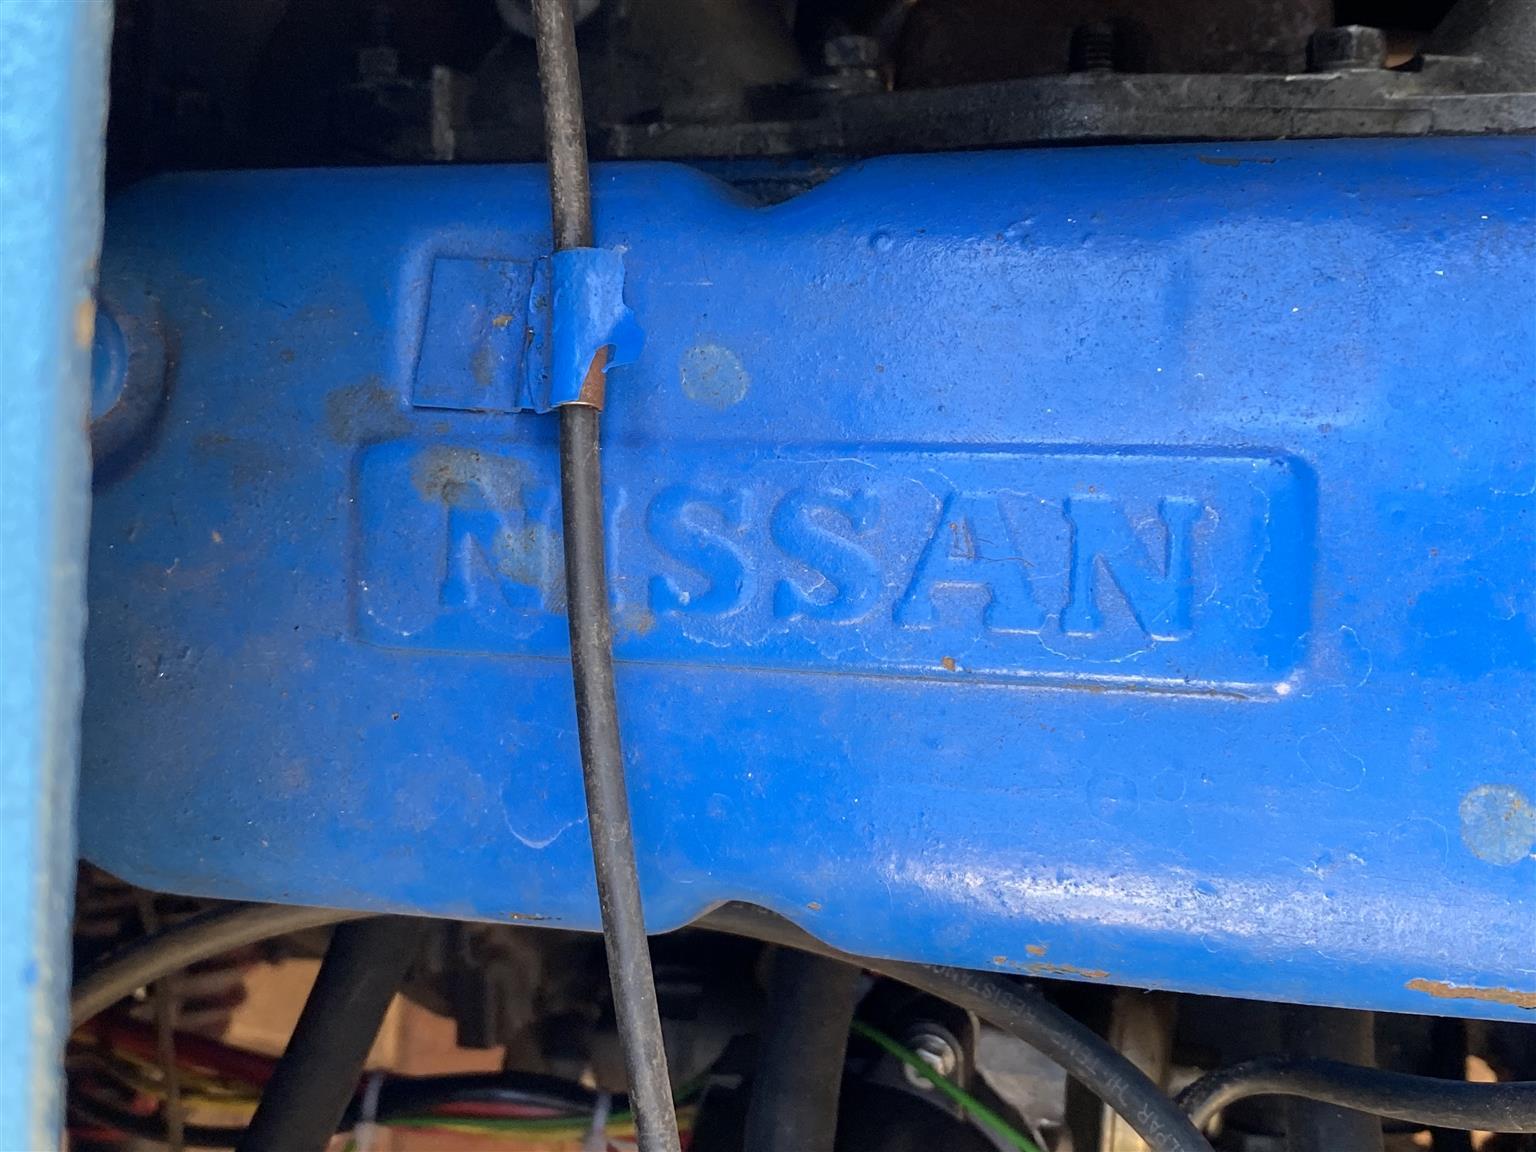 2008 Nissan 1400 Champ